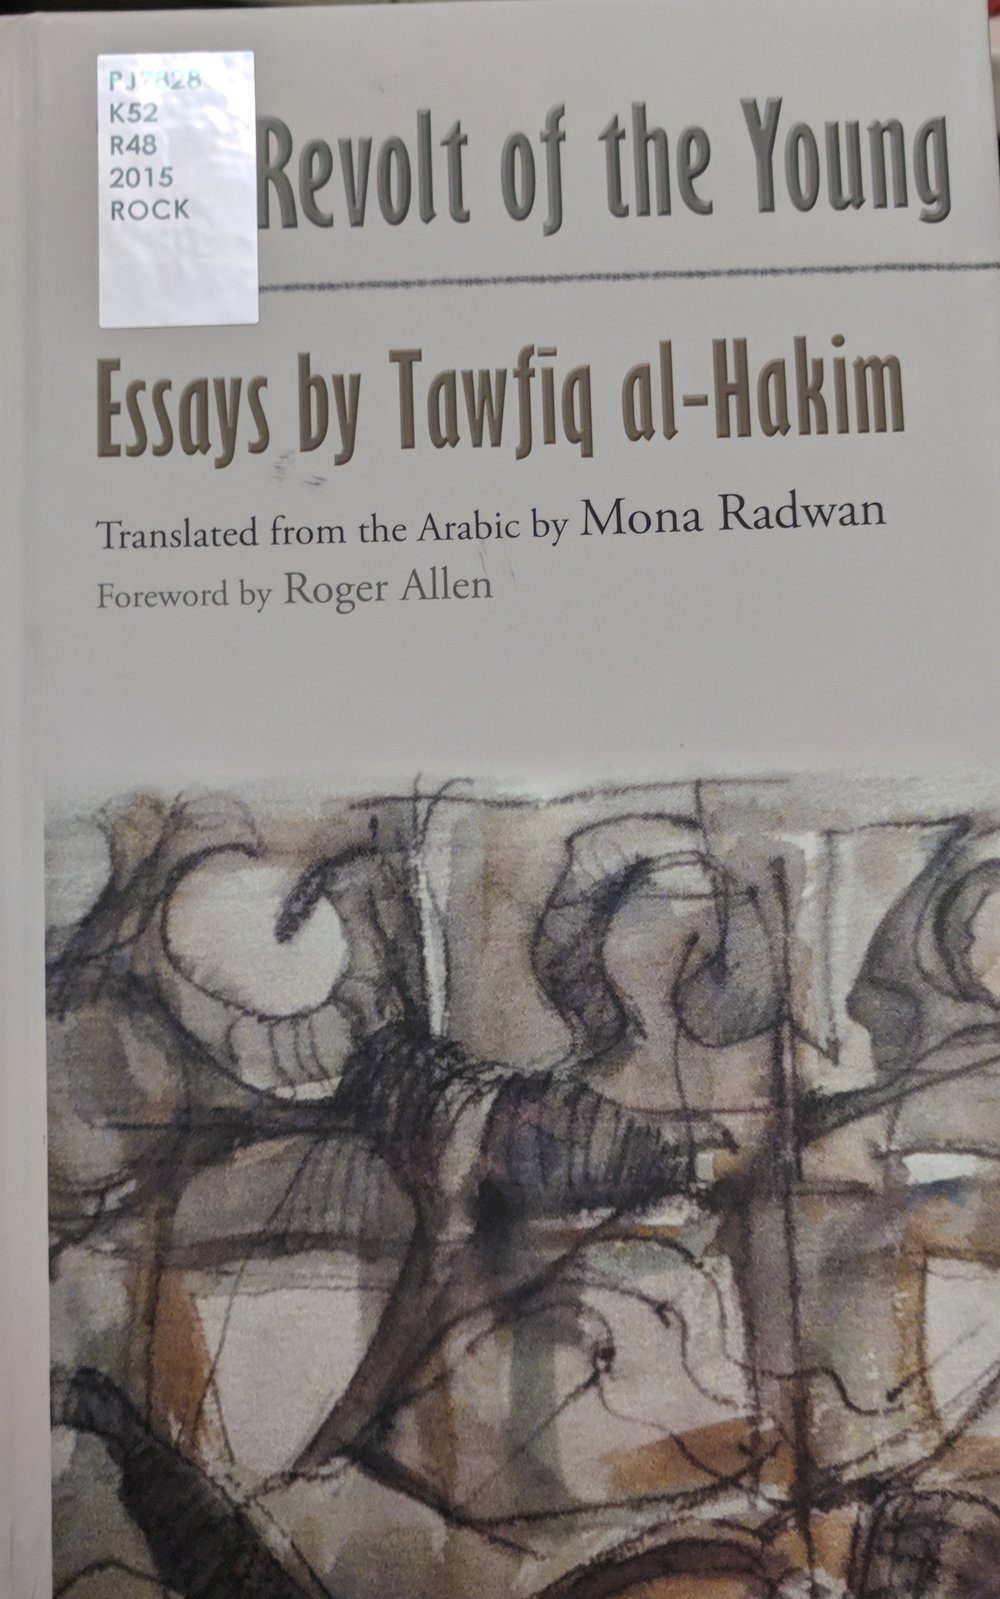 Tawfiq al-Hakim, translated by Mona Radwan,foreword by Roger Allen (Syracuse, New York : Syracuse University Press, 2015)